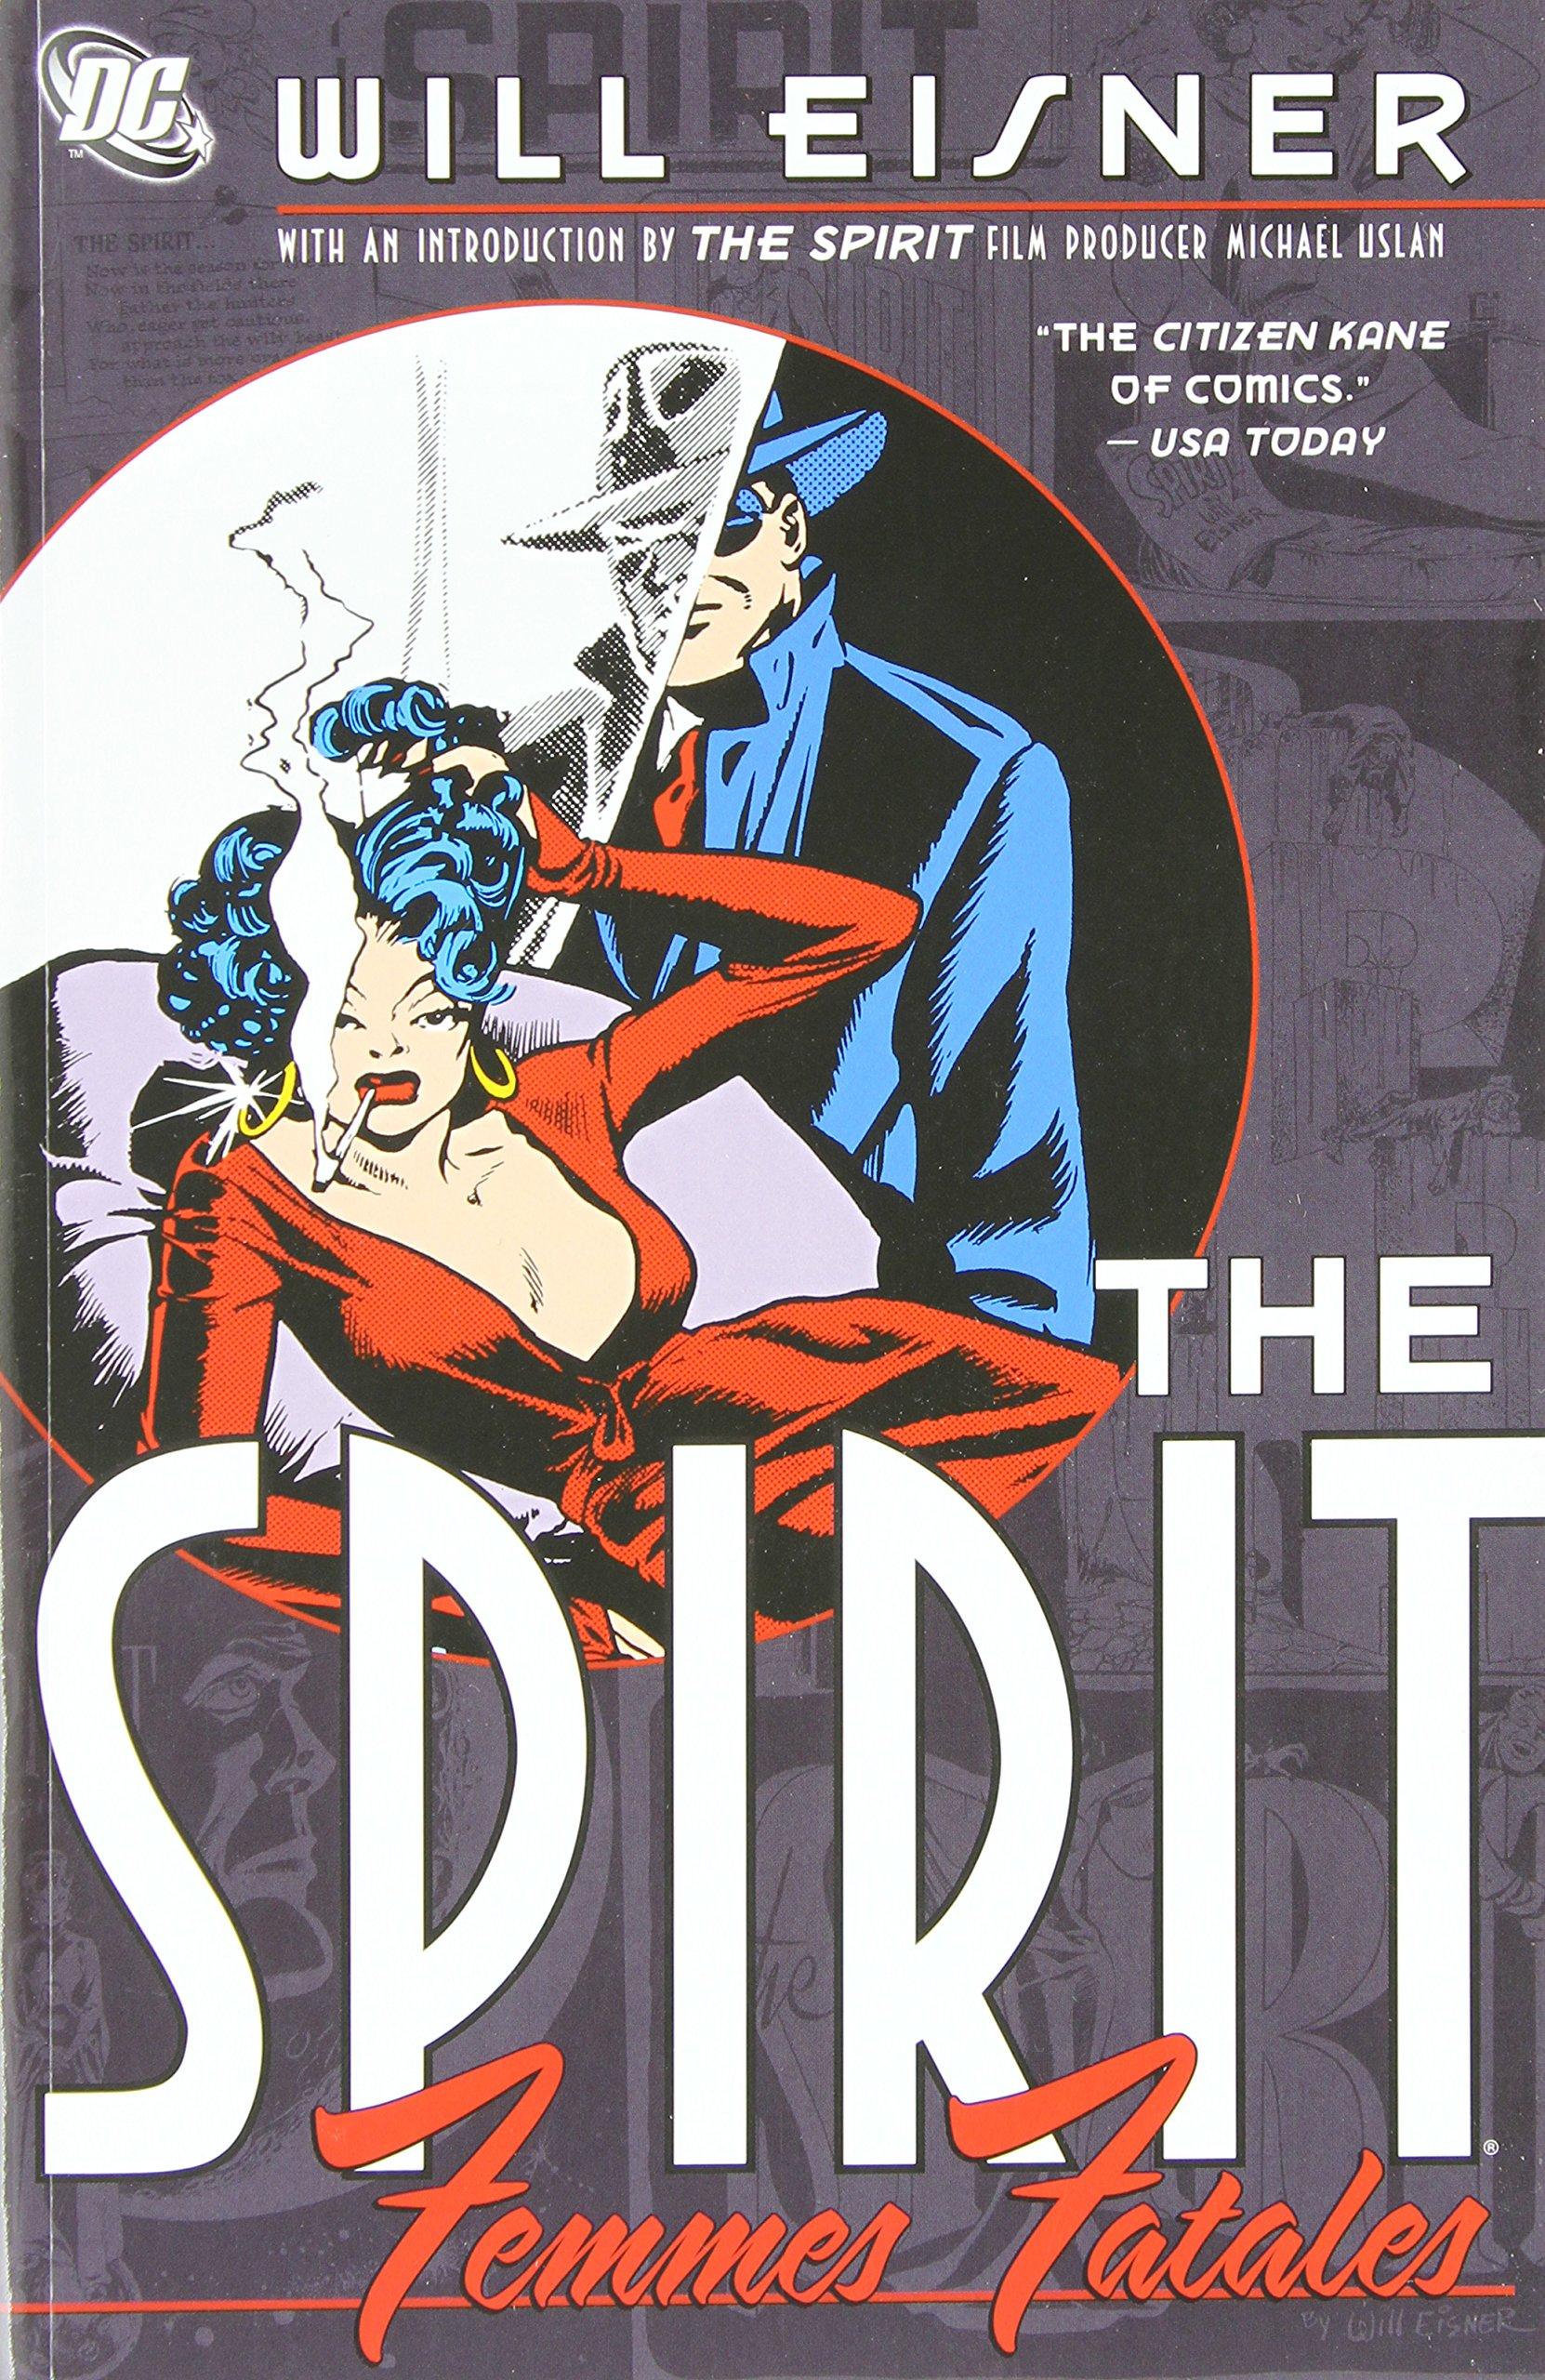 Read Online The Spirit: Femmes Fatales (Spirit (DC Comics)) PDF ePub fb2 book